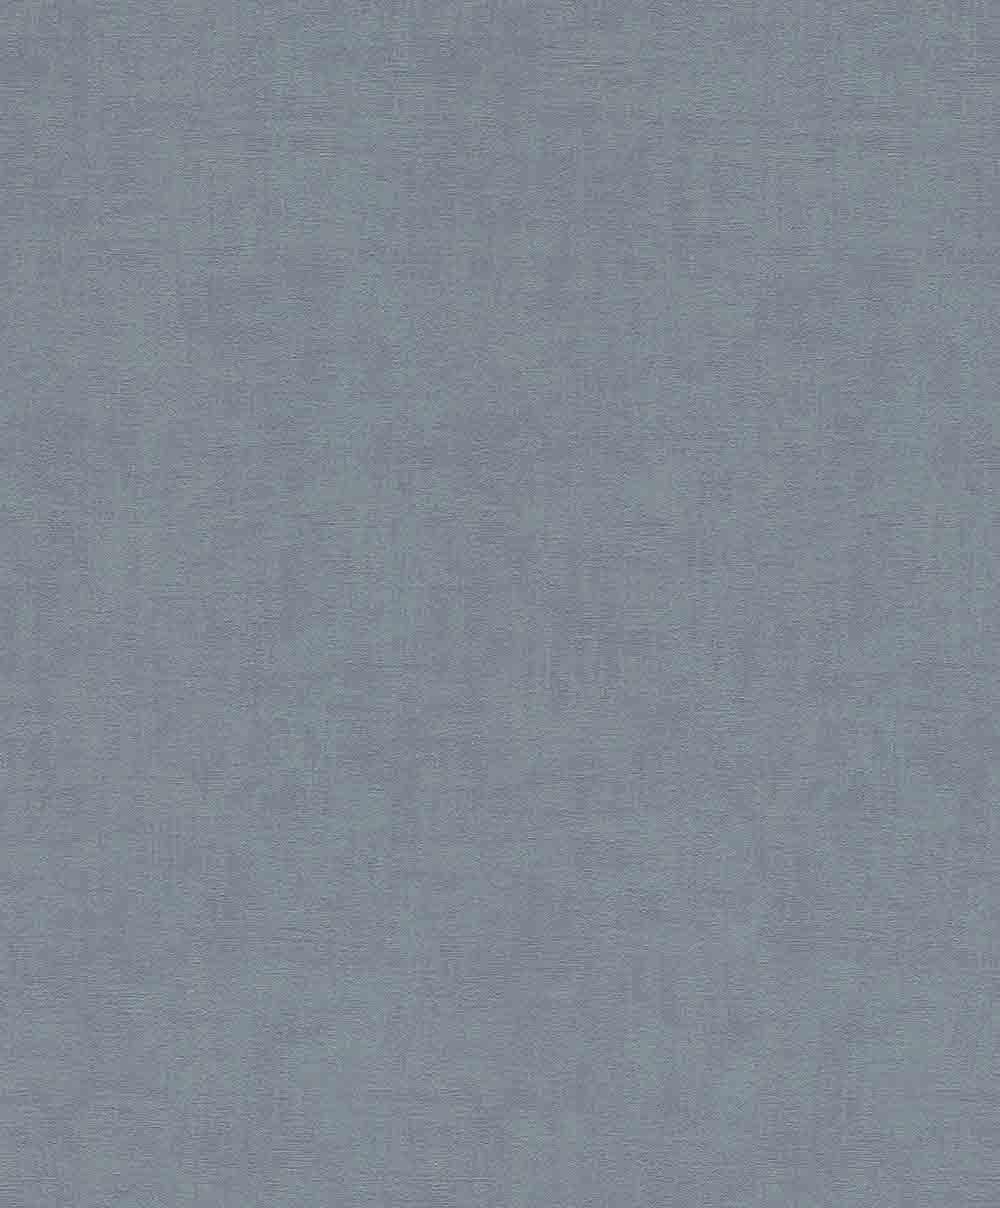 Wand Graublau: Vlies Tapete Uni Einfarbig Rasch Graublau 489781